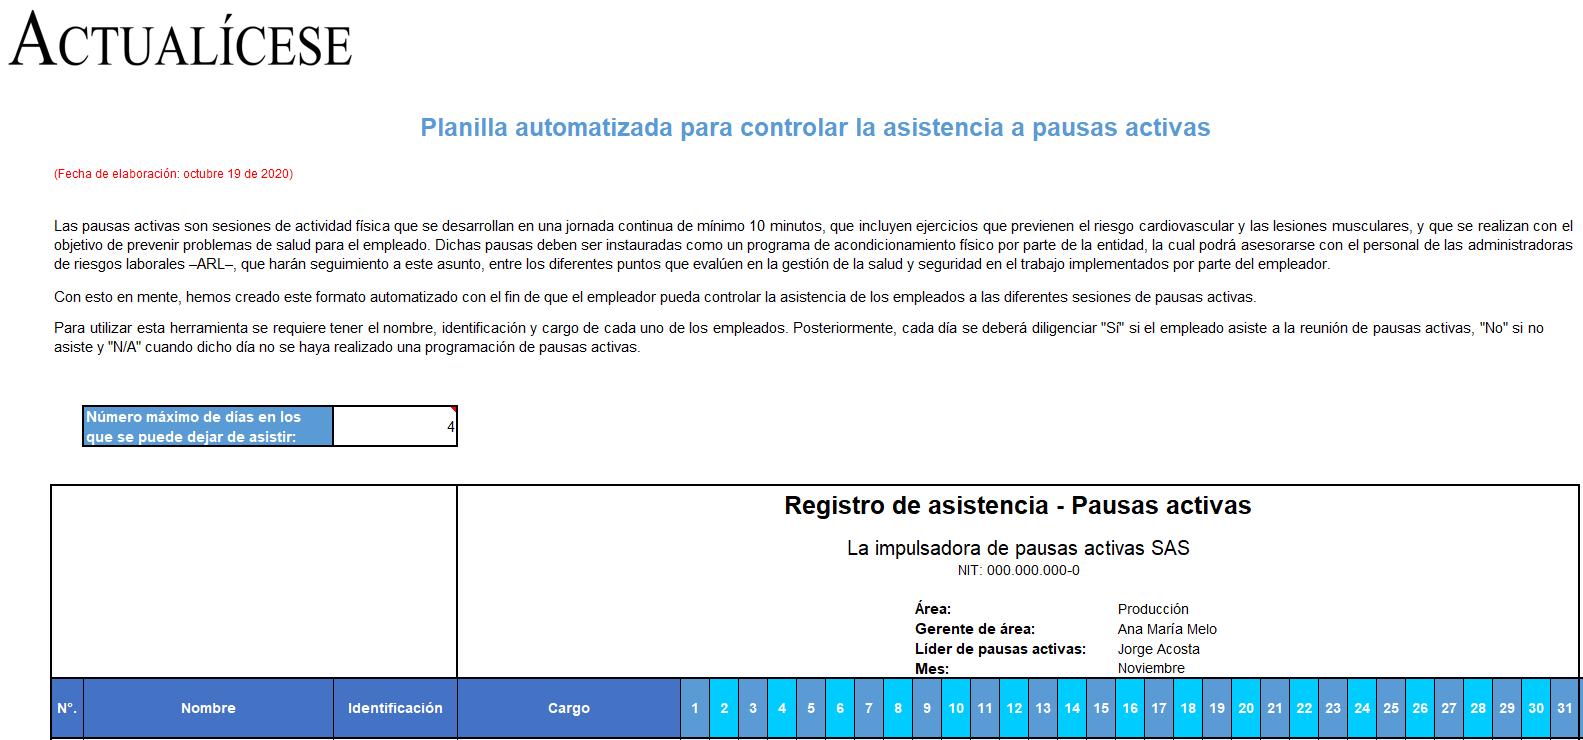 Planilla automatizada para controlar la asistencia a pausas activas